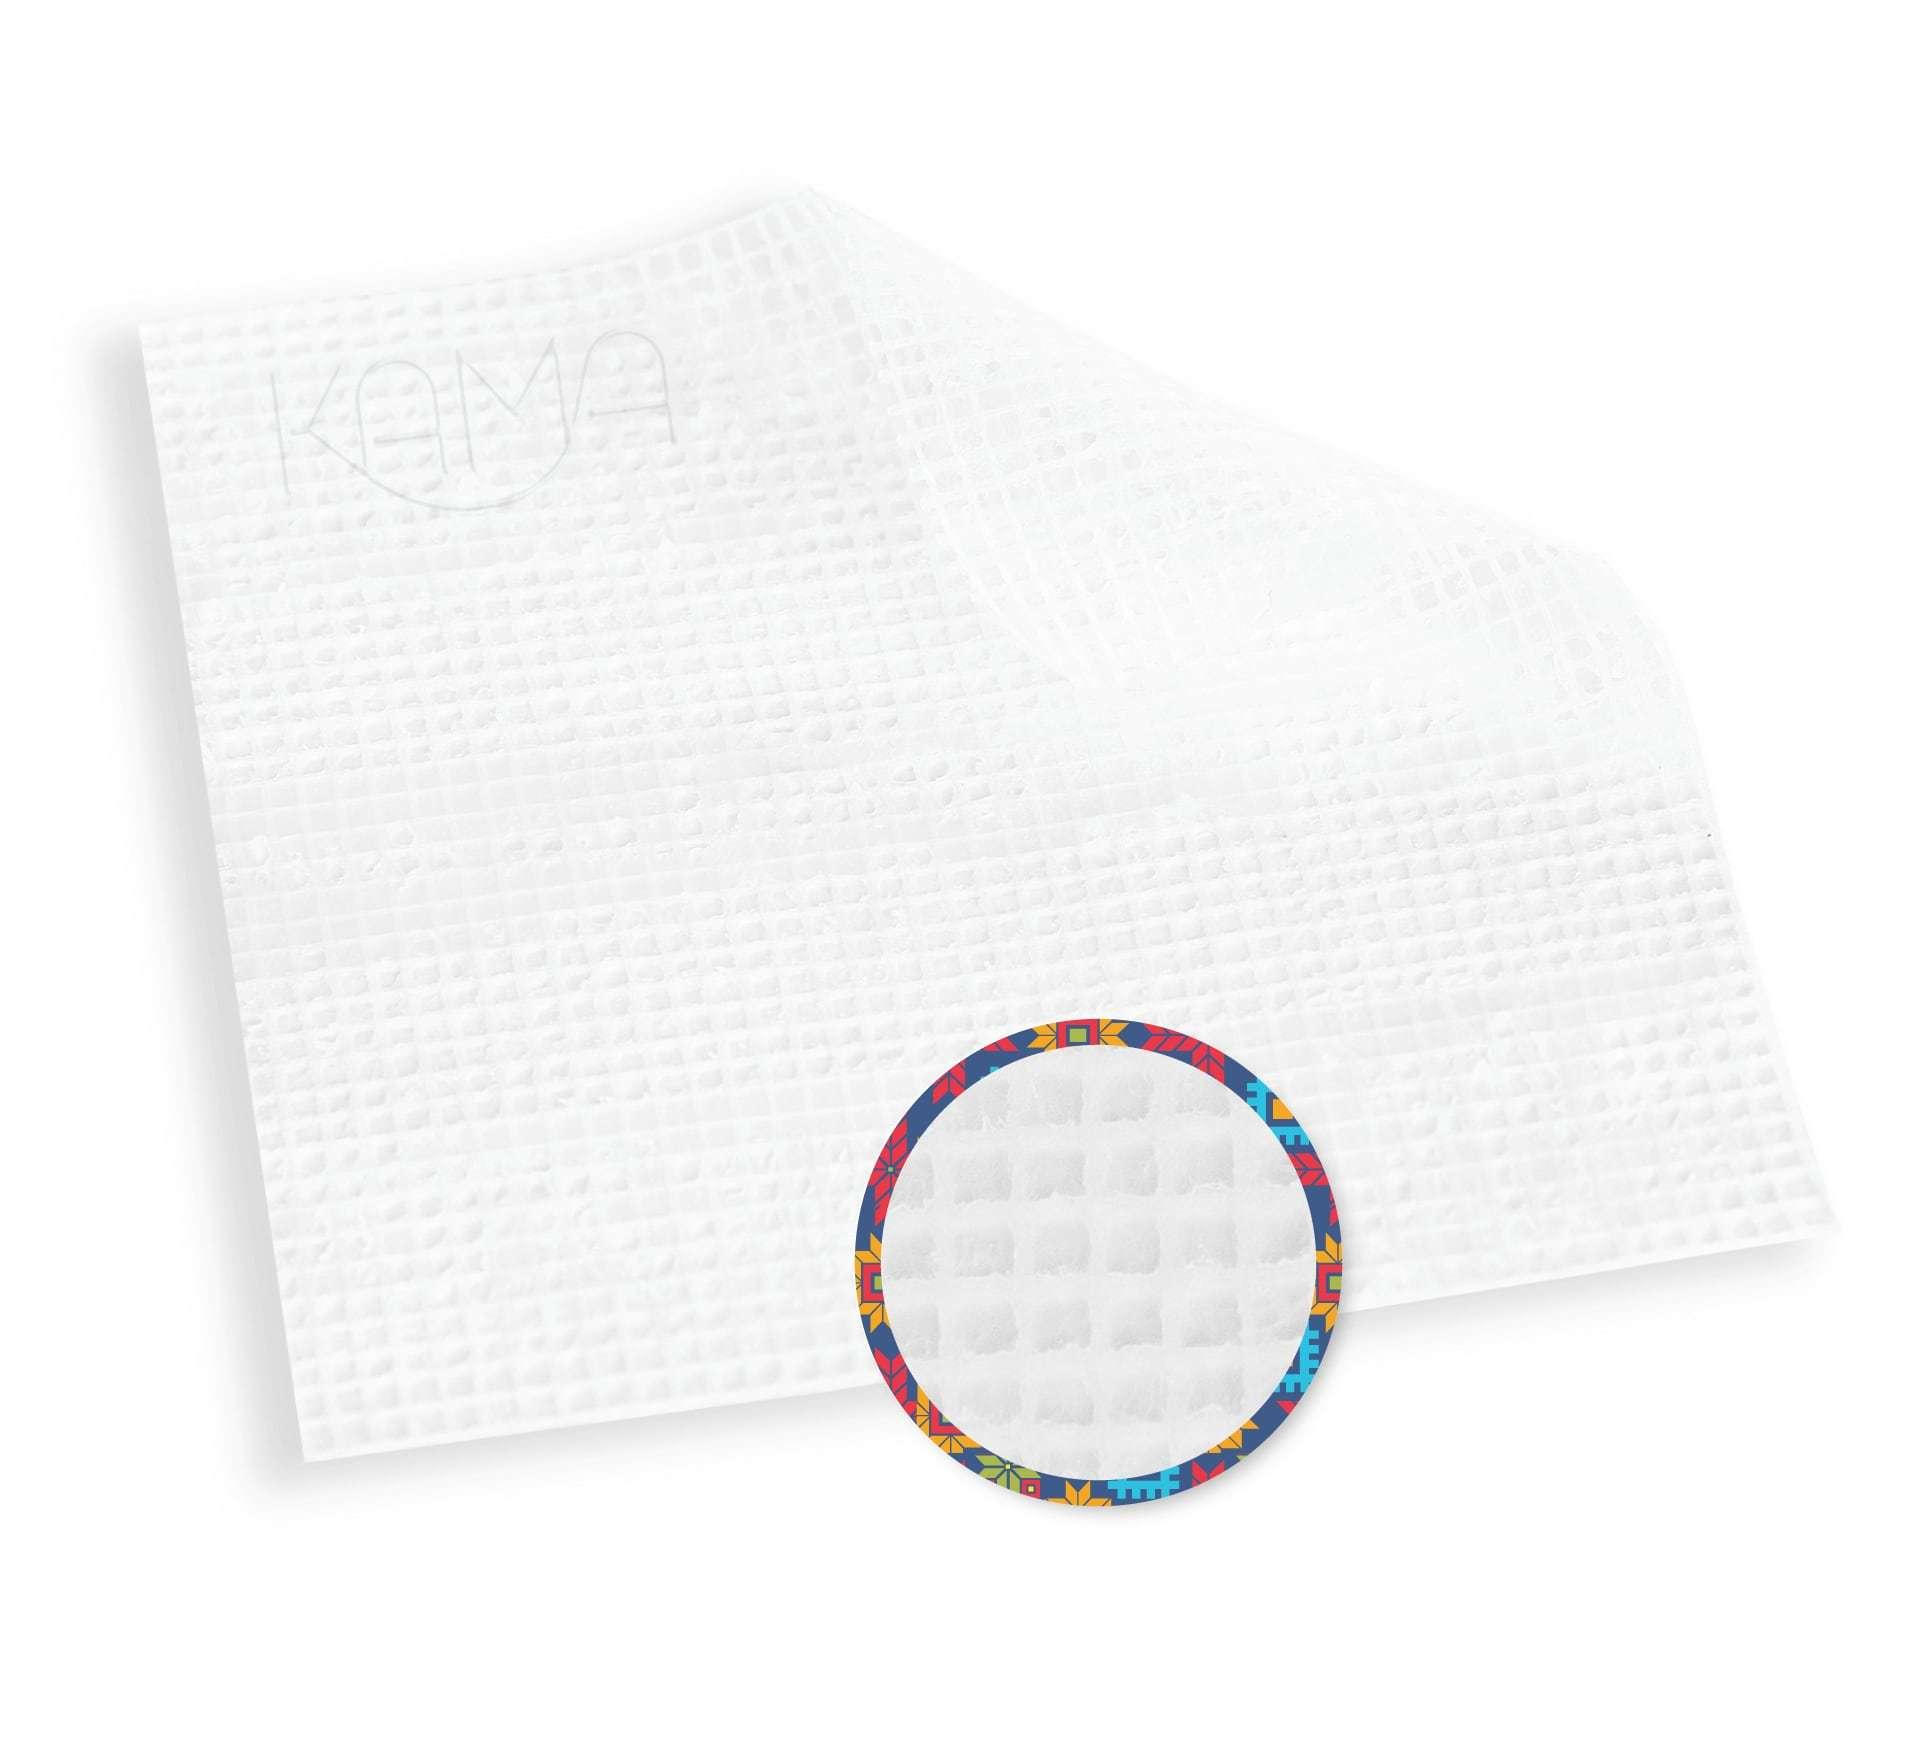 ГексоТекс (HexoTex) 15х25 см набор из 5 повязок + подарок